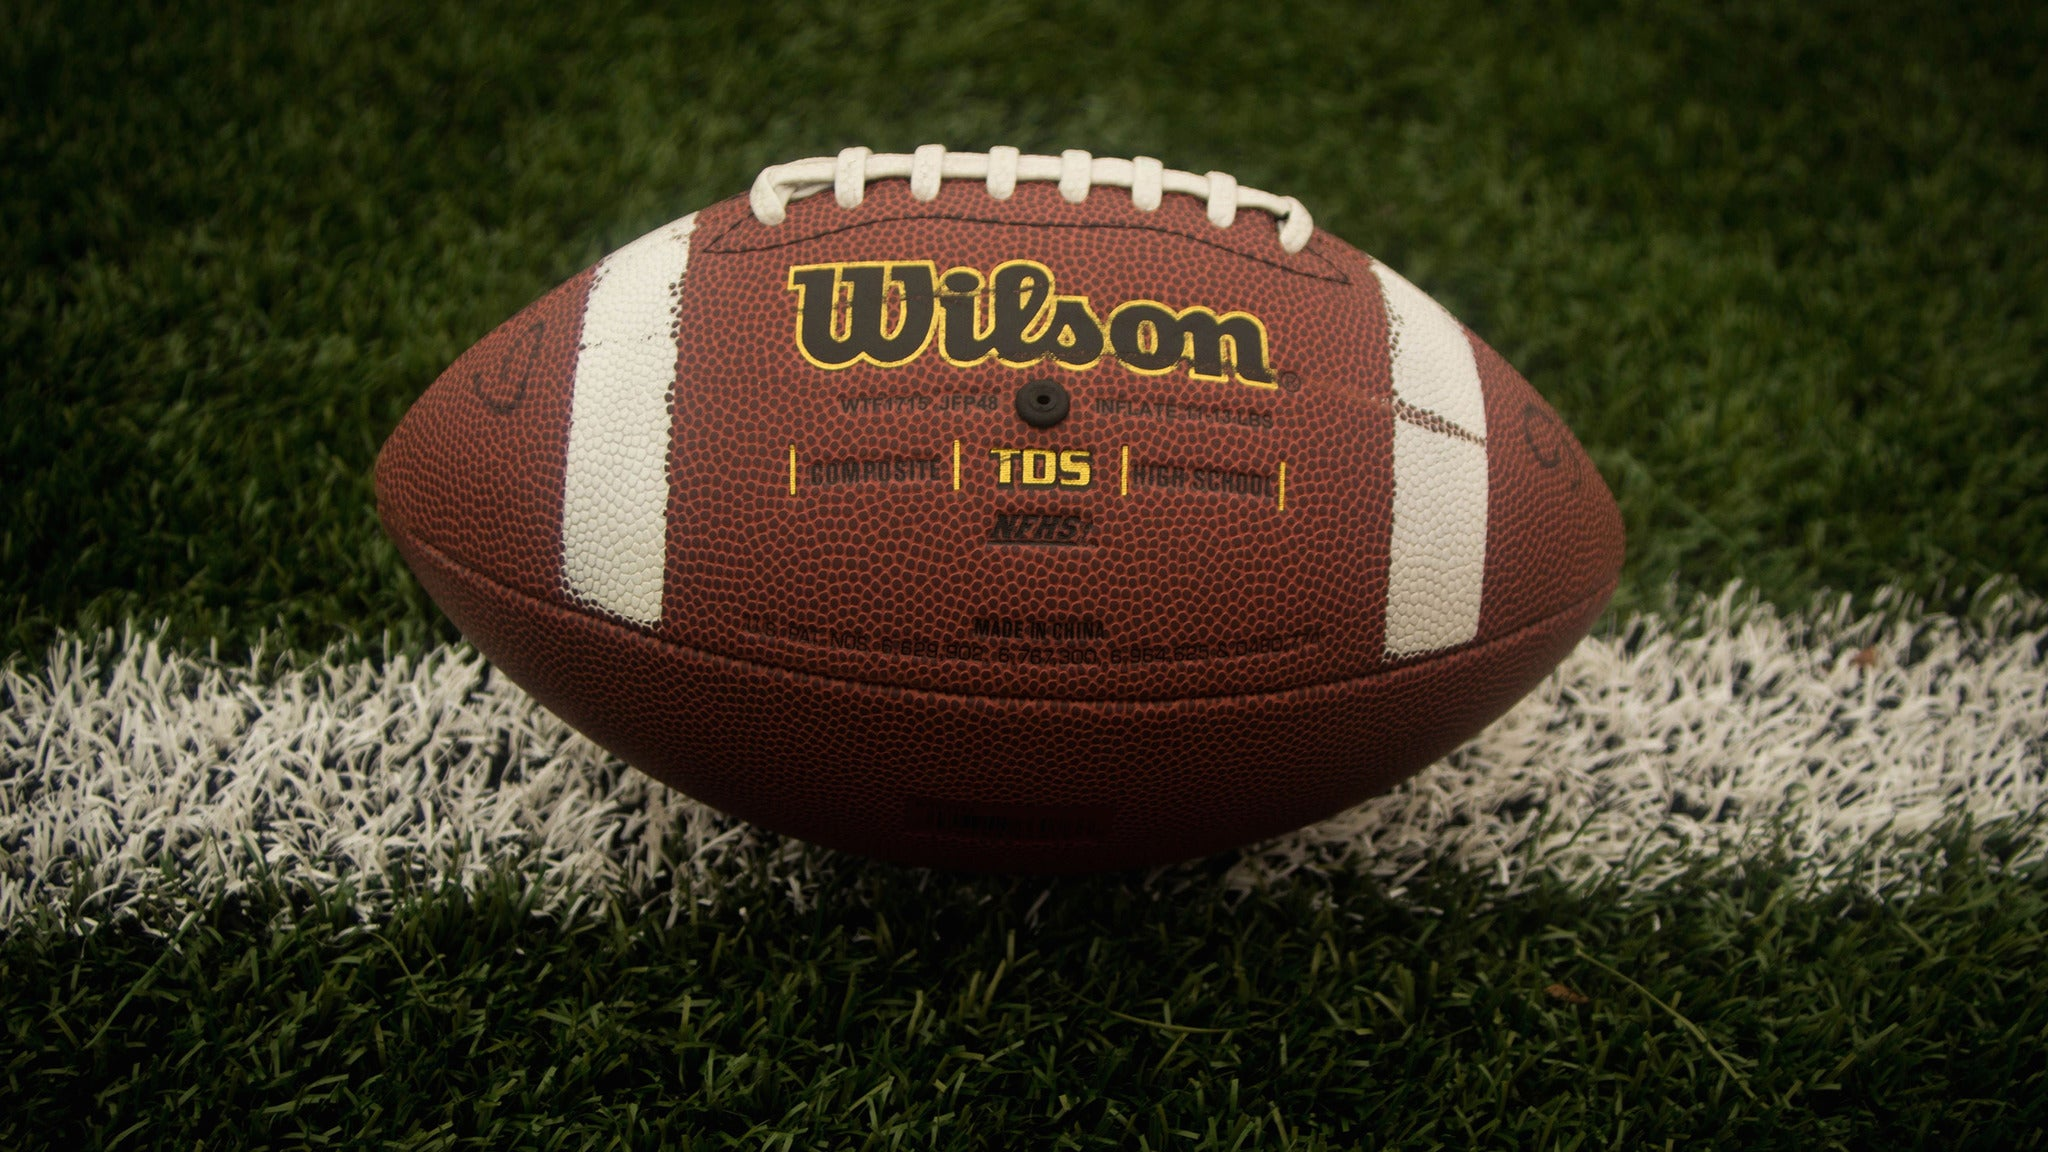 South Alabama Jaguars Football at Ole Miss Rebels Football